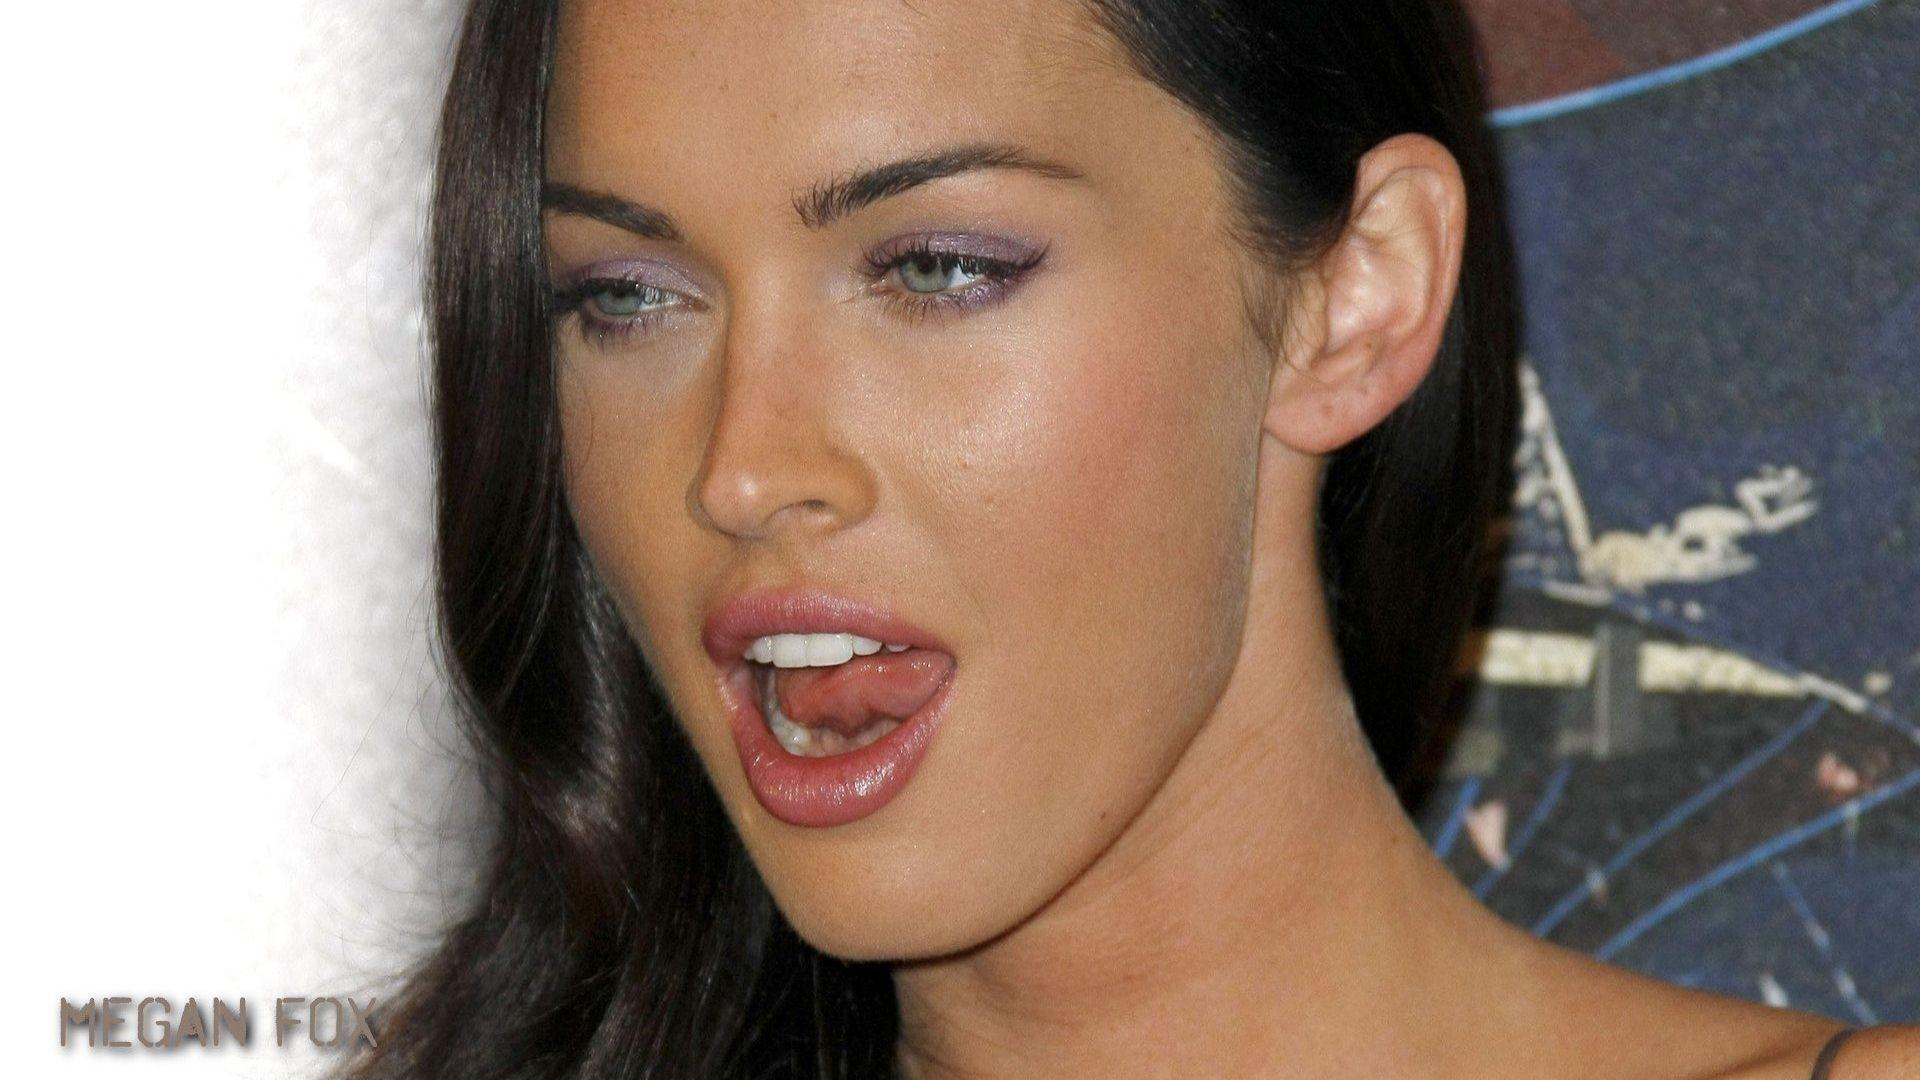 Wallpaper Face Women Model Singer Blue Mouth Nose: Wallpaper : Face, Women, Model, Long Hair, Open Mouth